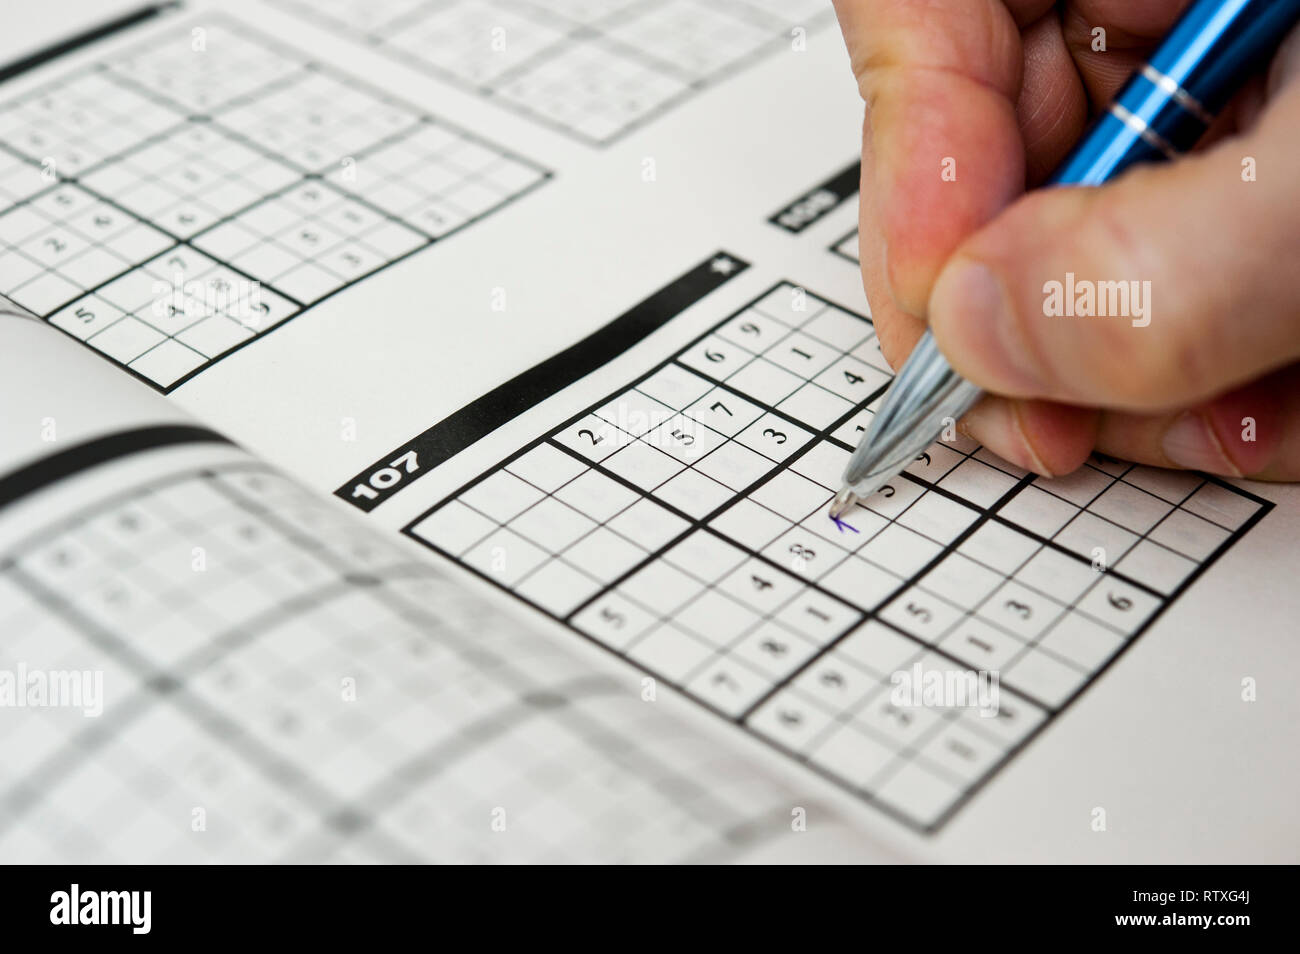 Sudoku Stock Photos & Sudoku Stock Images - Alamy